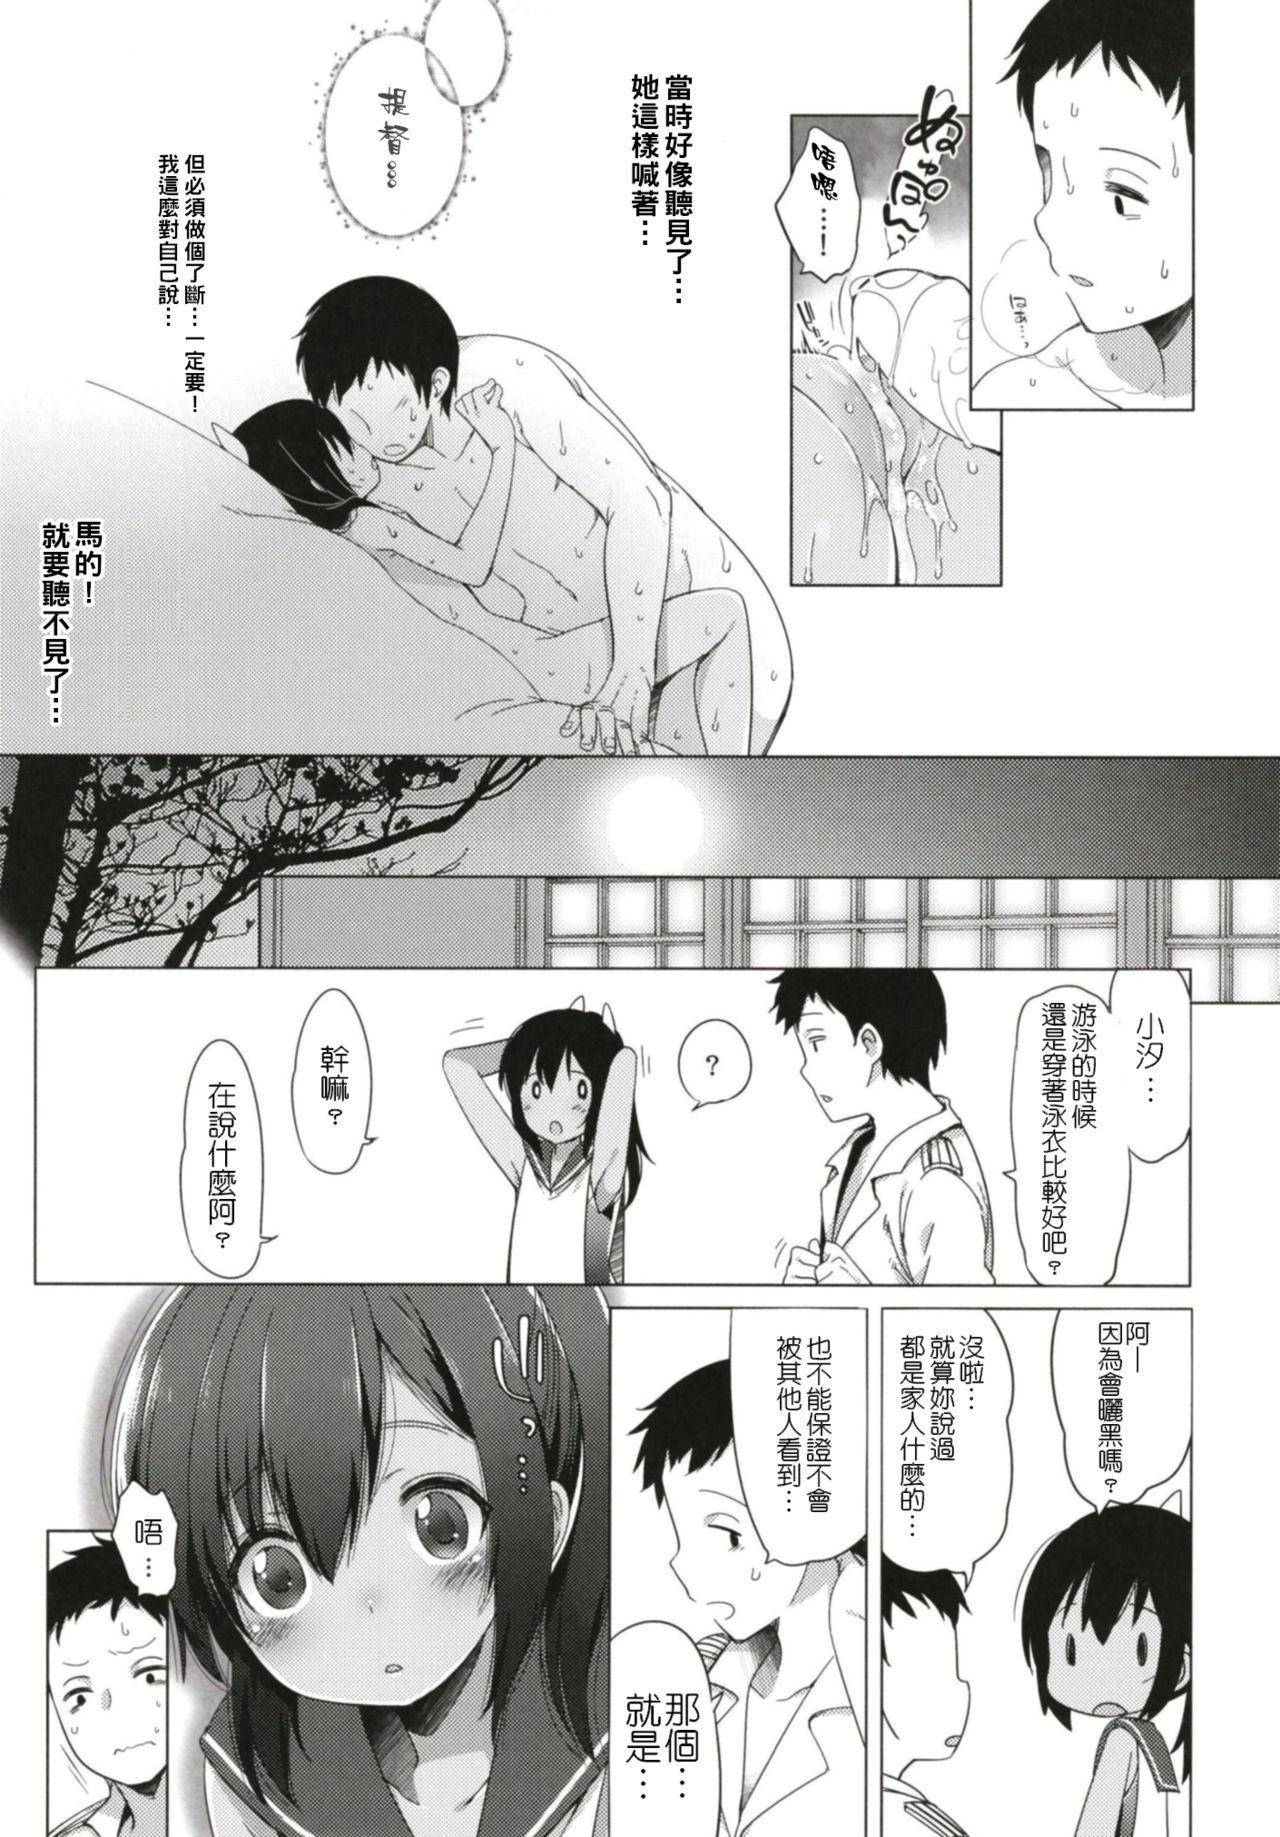 [French letter (Fujisaki Hikari)] Hitonatsu no Ayamachi -I-401 Soushuuhen- (Kantai Collection -KanColle-) [Chinese] [Digital] 20